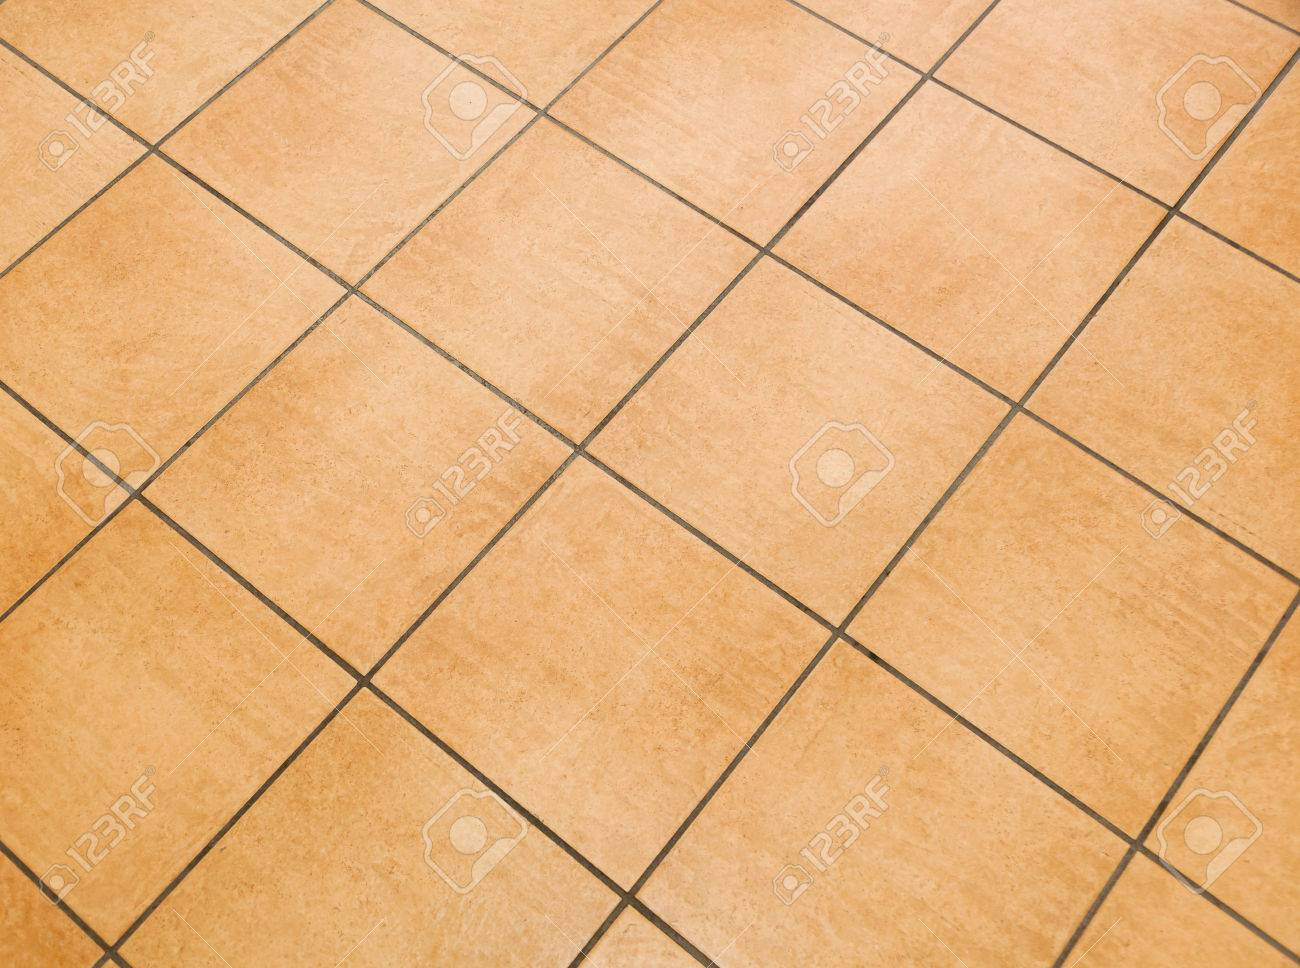 Brown Ceramic Floor Tiles Close Up Texture Stock Photo